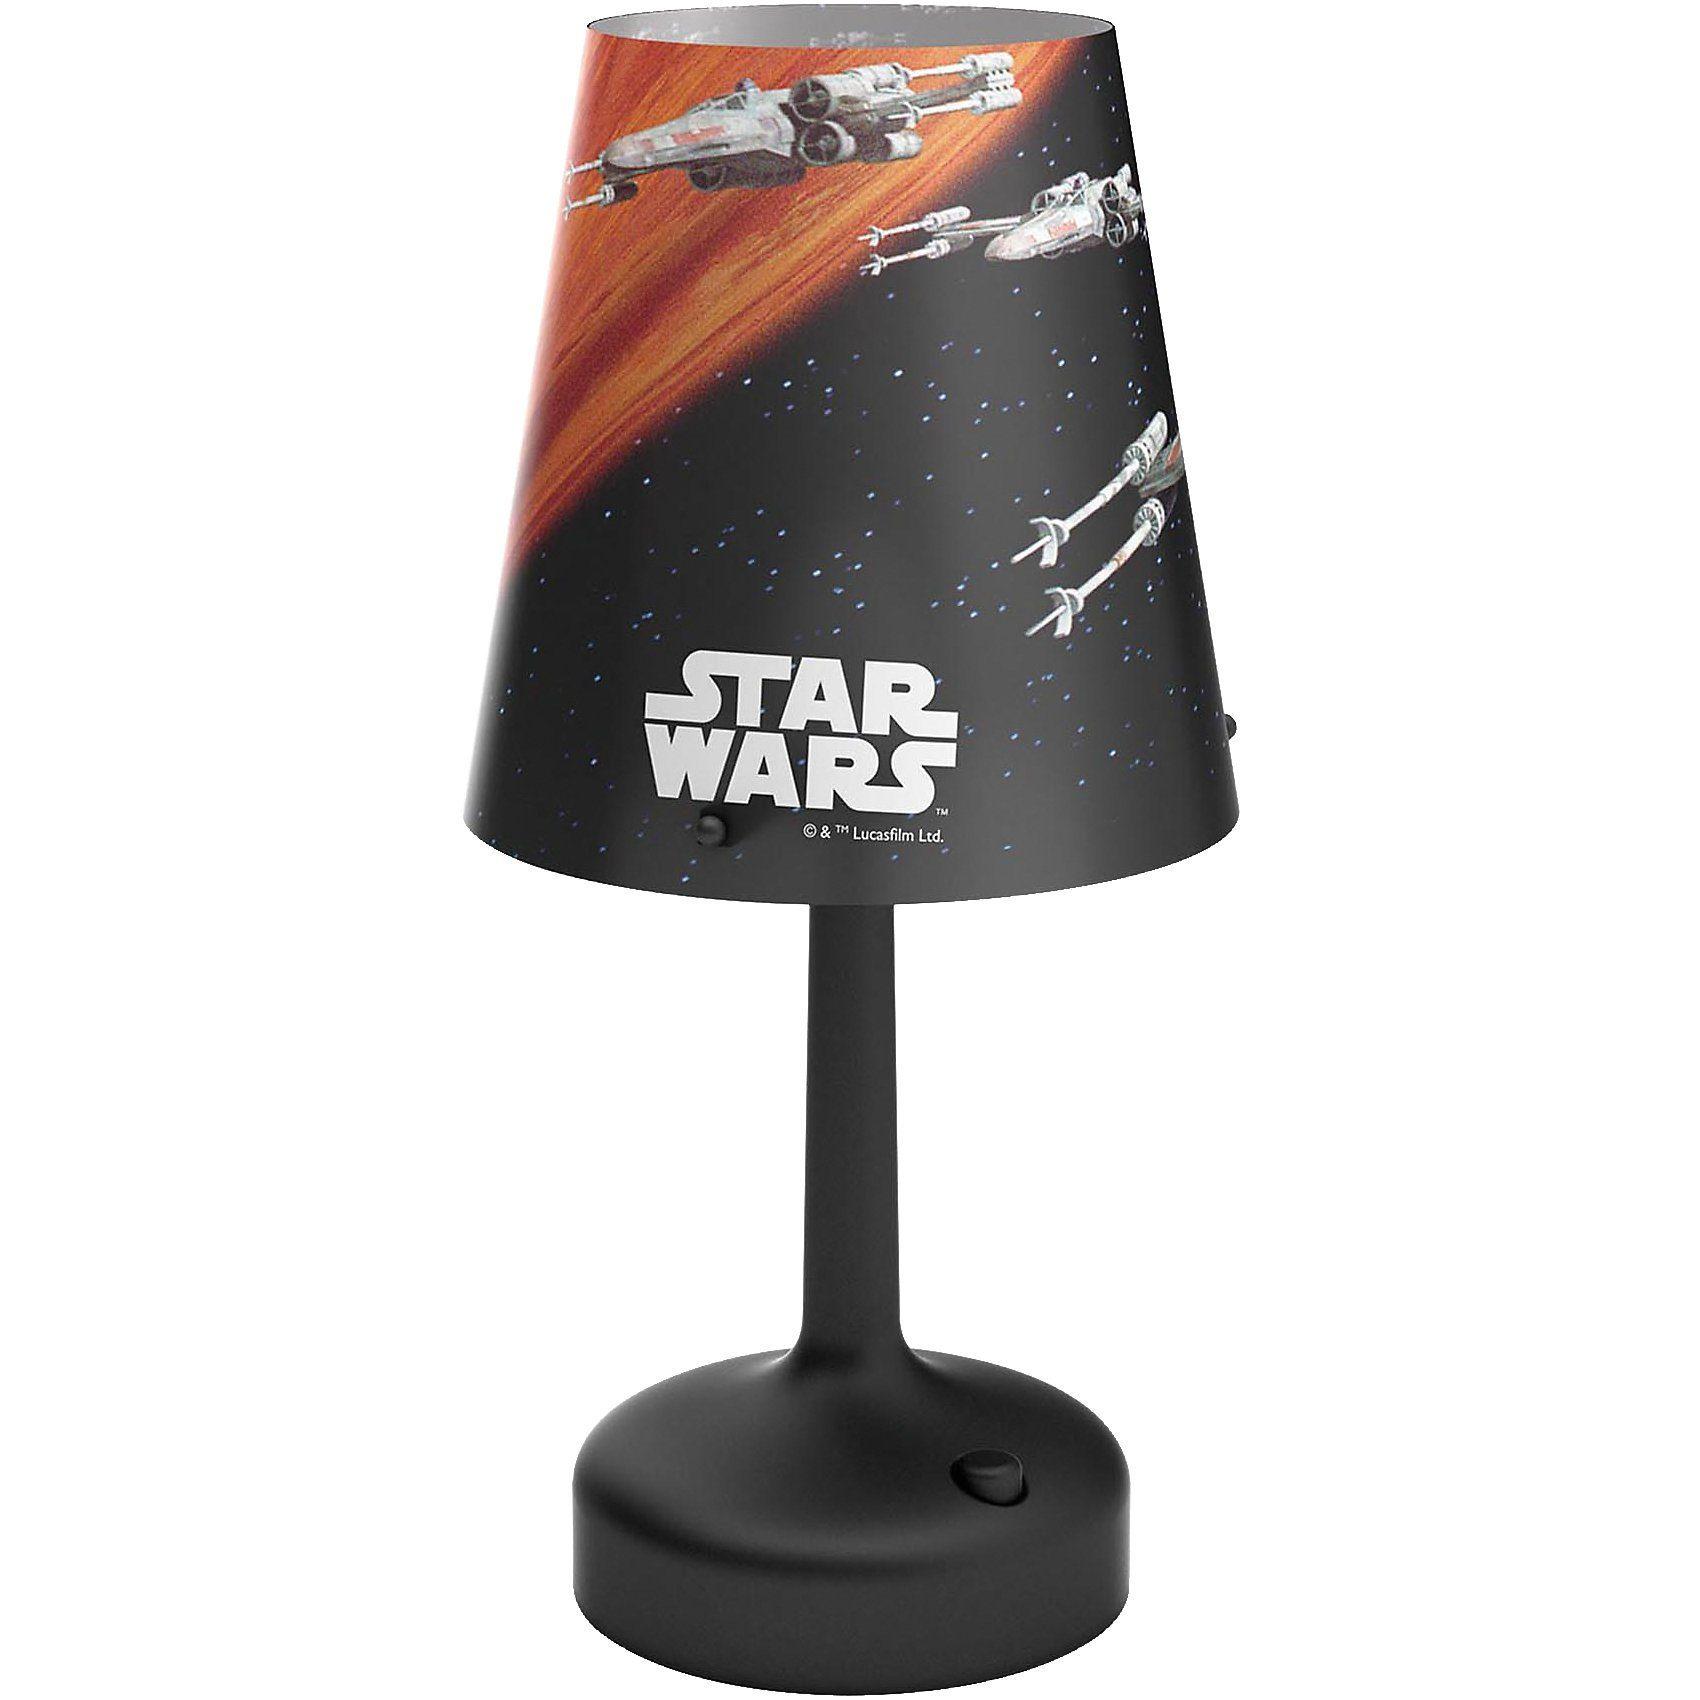 Philips Lighting Tragbare LED Nacht-/Tischleuchte Star Wars X-Wing